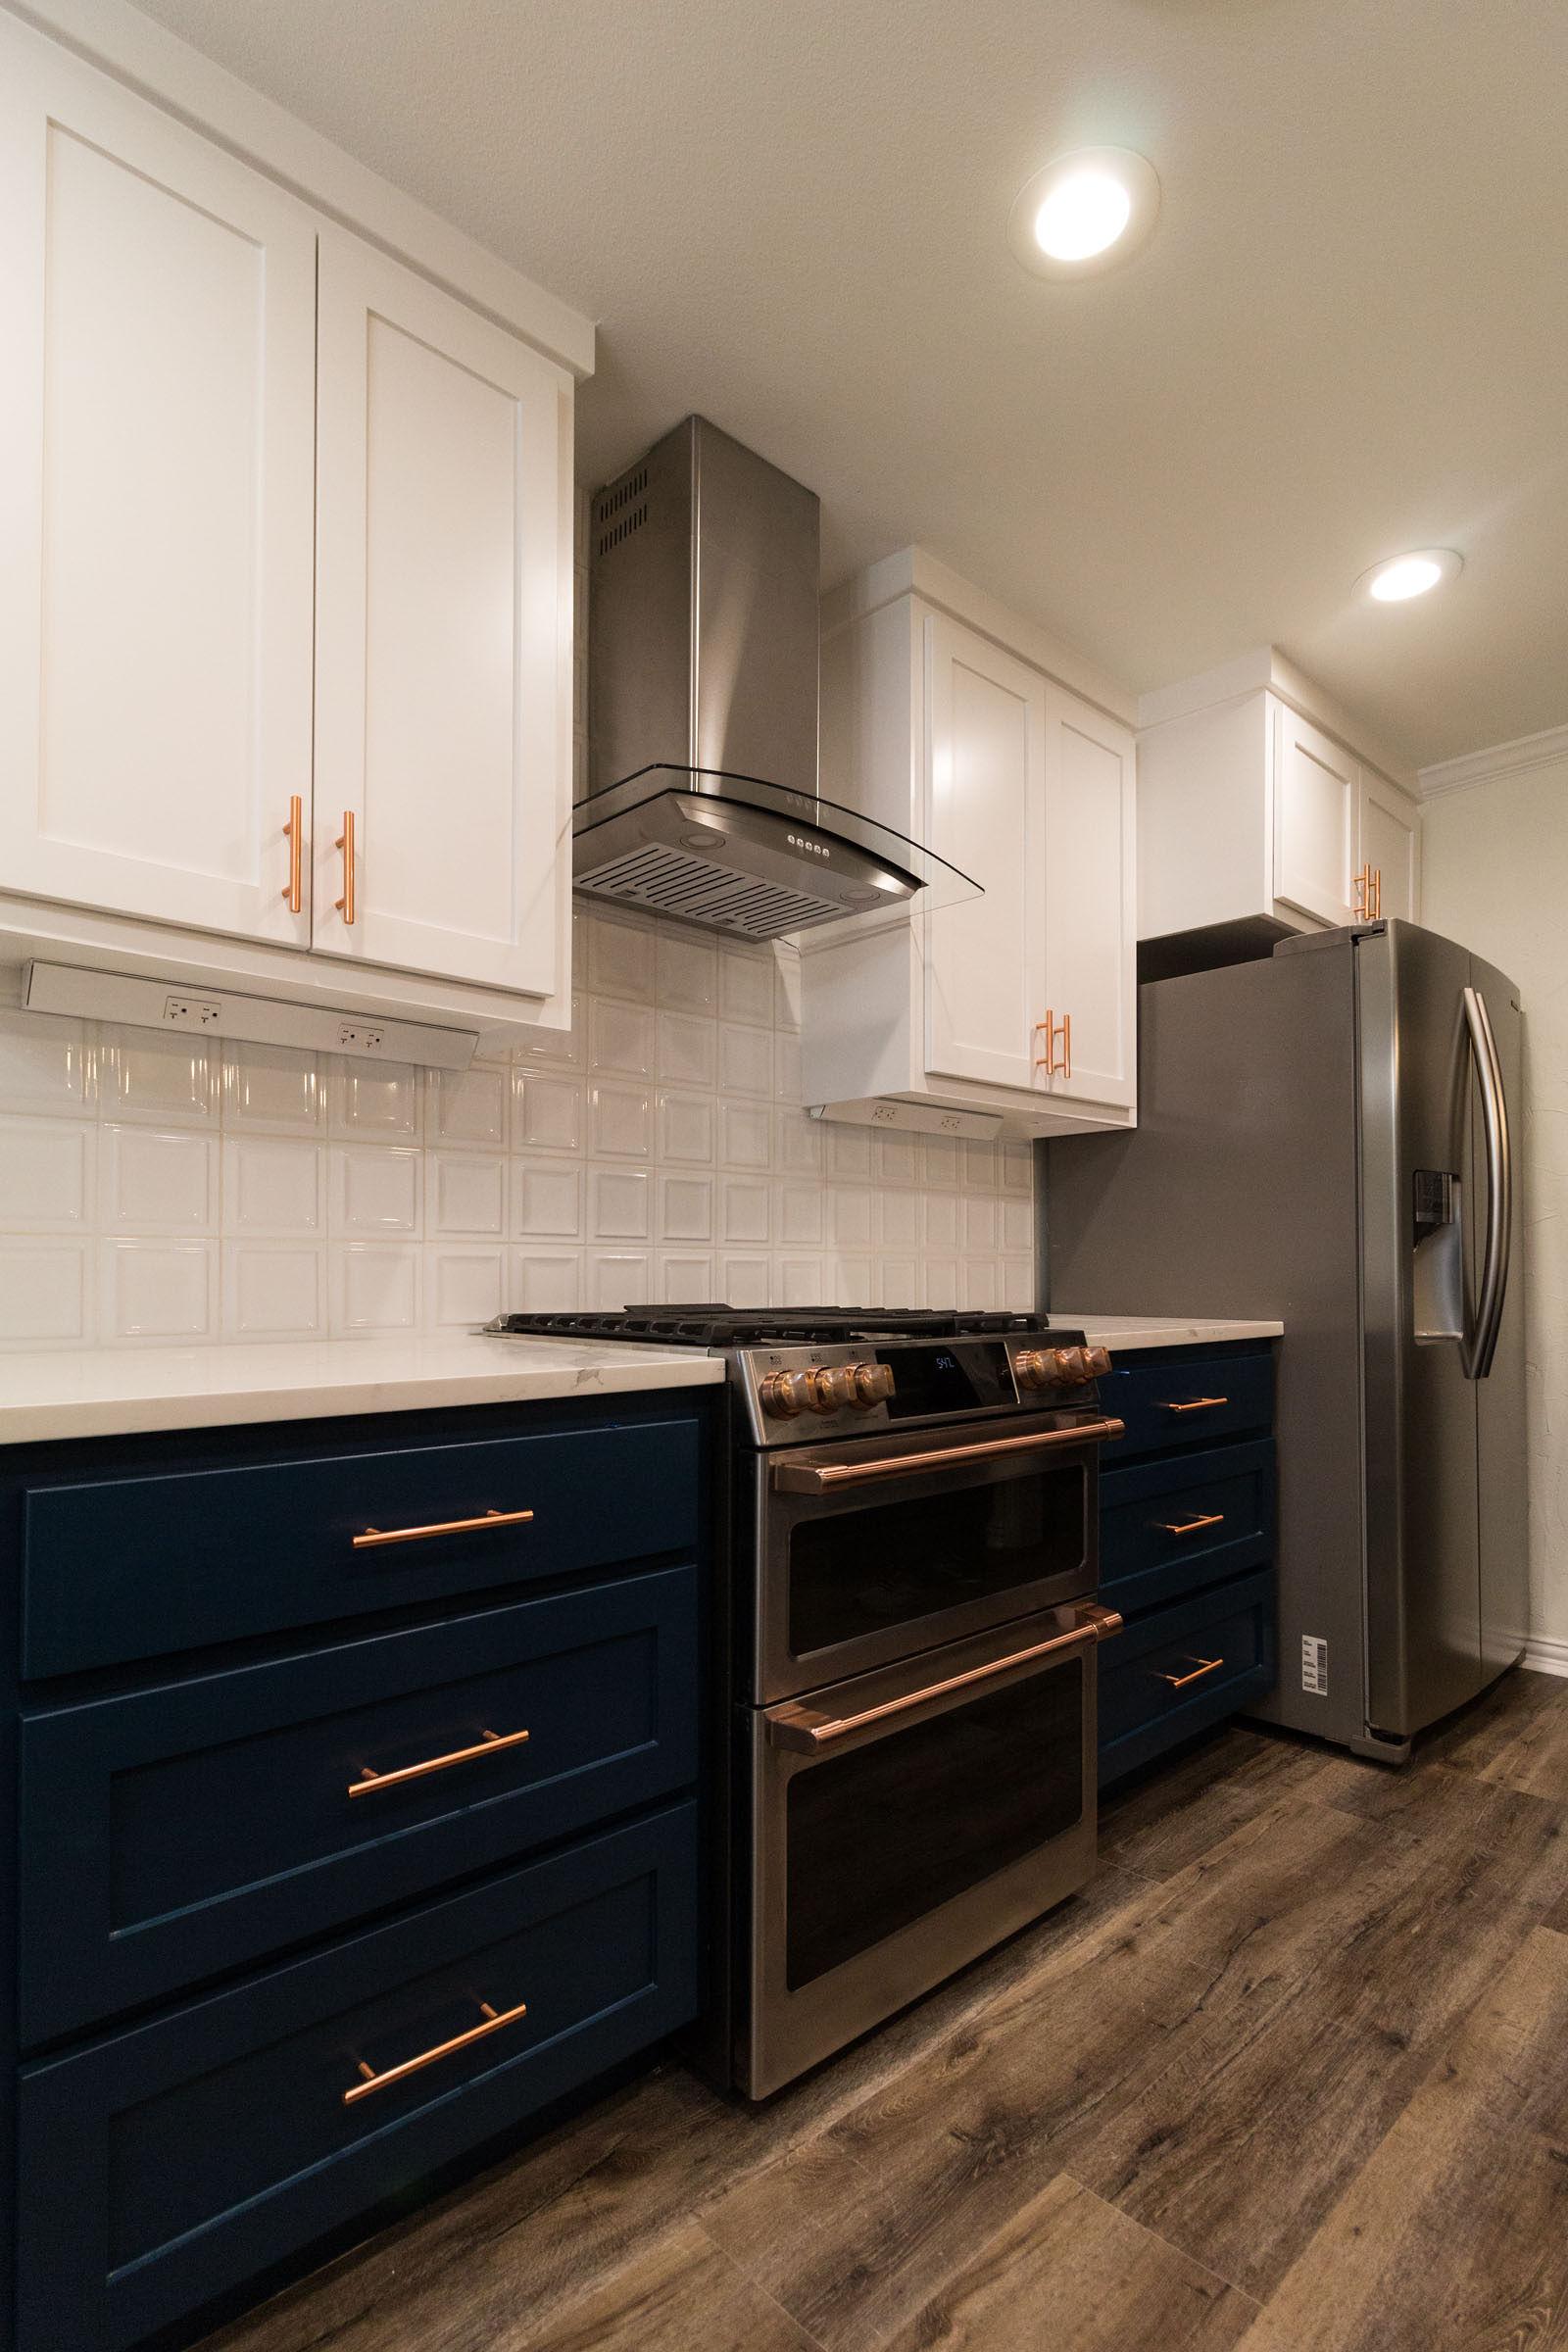 Navy cabinets, copper hardware, white uppers, square backsplash, vent hood, and hardwood floors